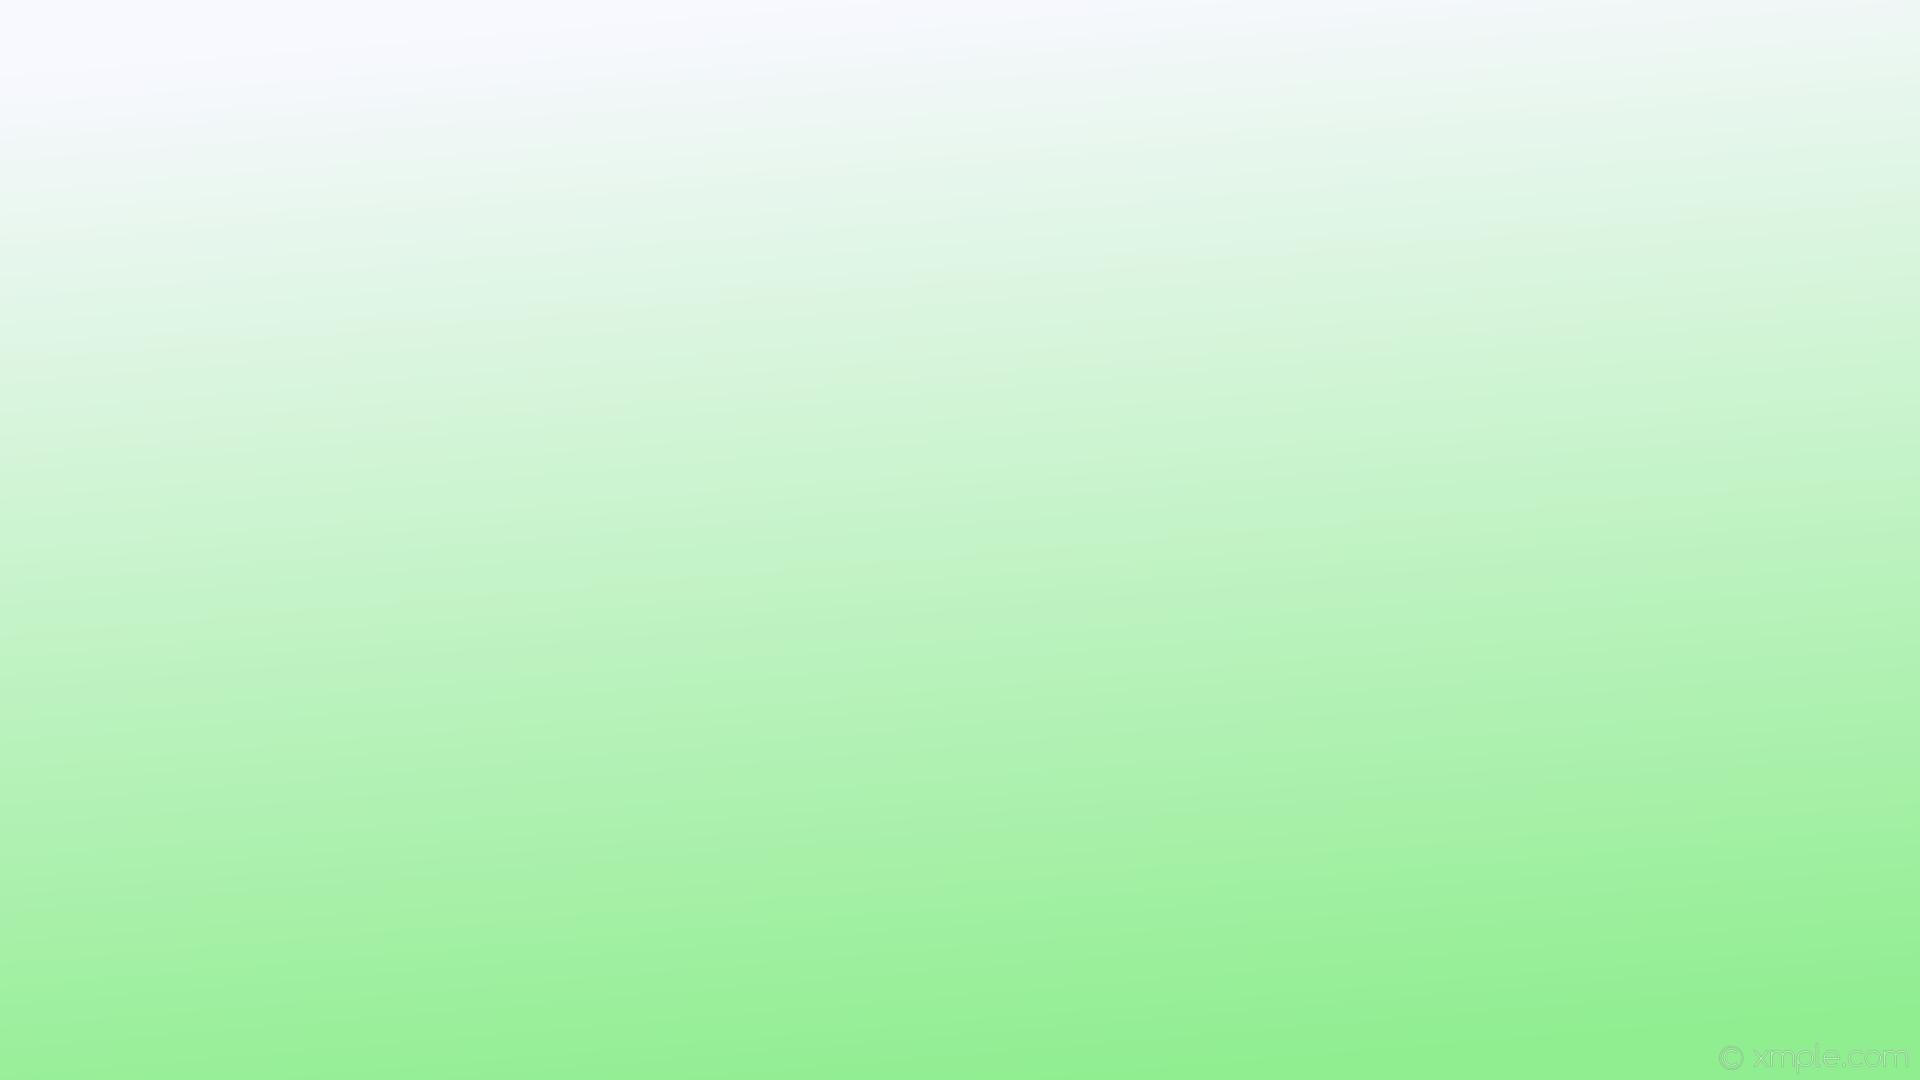 wallpaper linear green white gradient light green ghost white #90ee90  #f8f8ff 285°